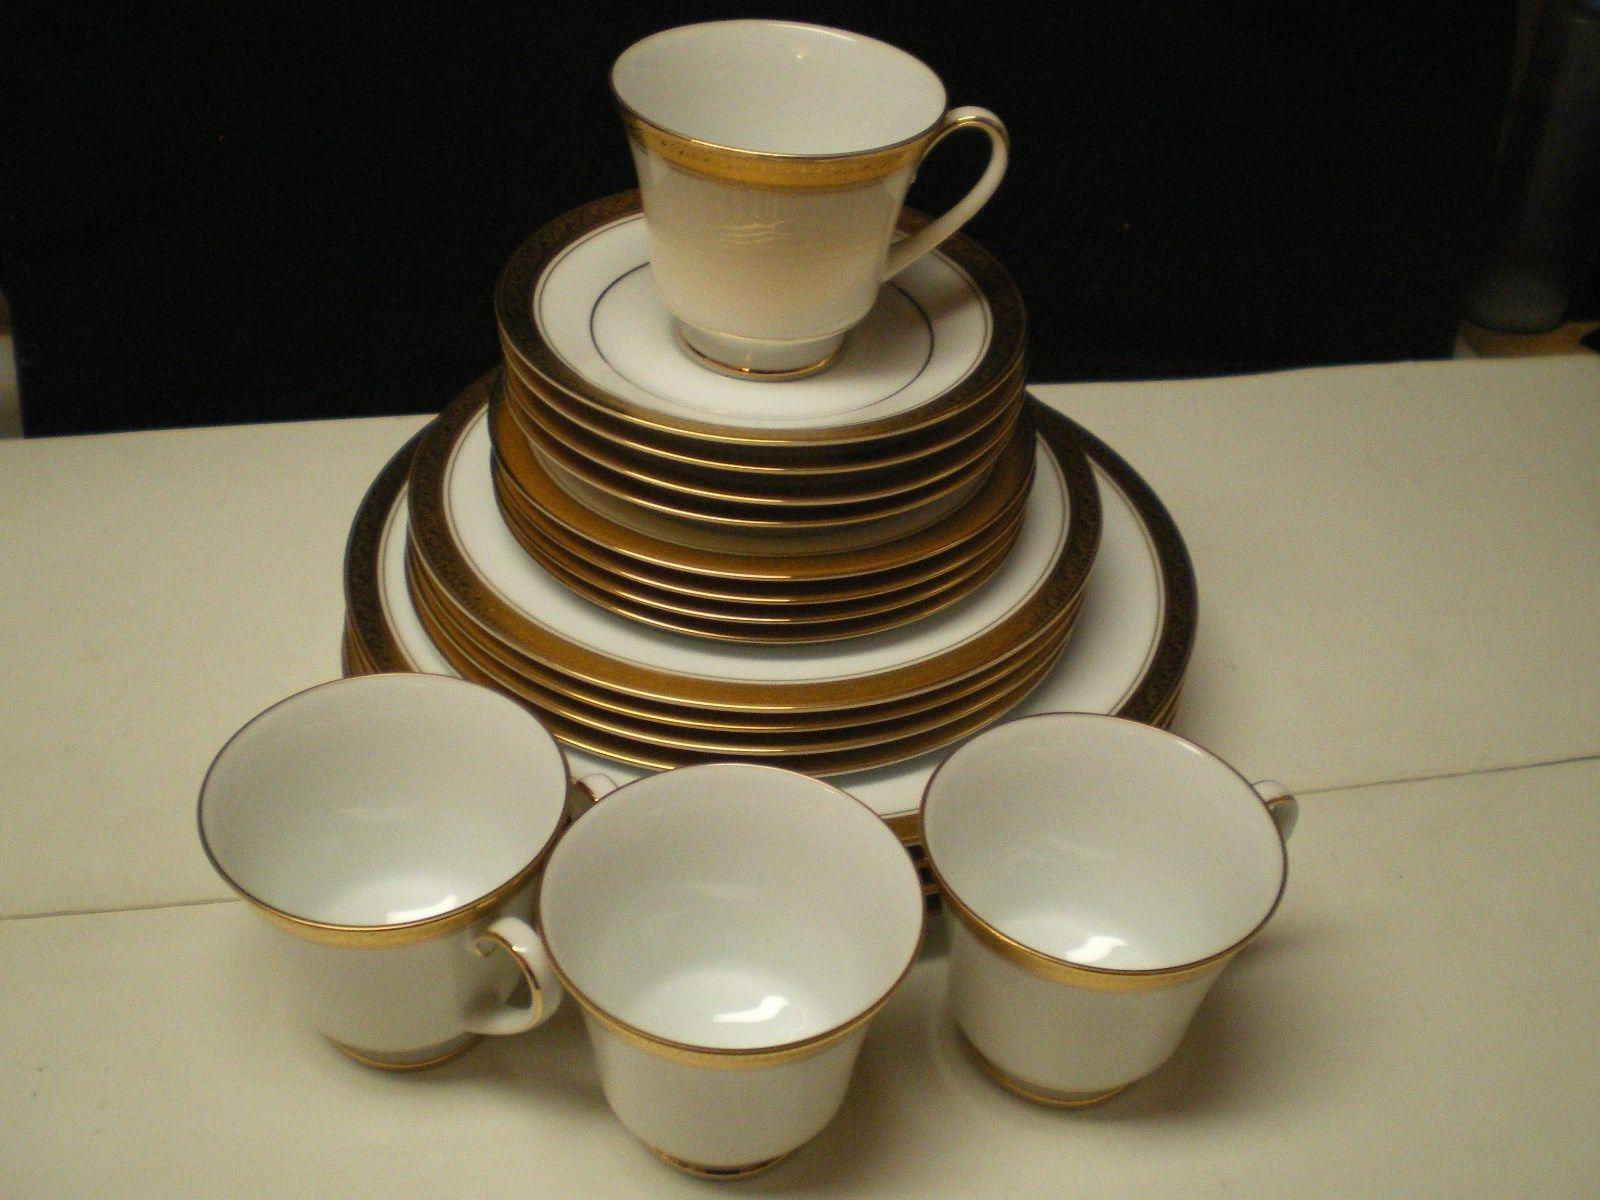 Noritake Crestwood Gold 20 Piece Dinnerware and 30 similar items